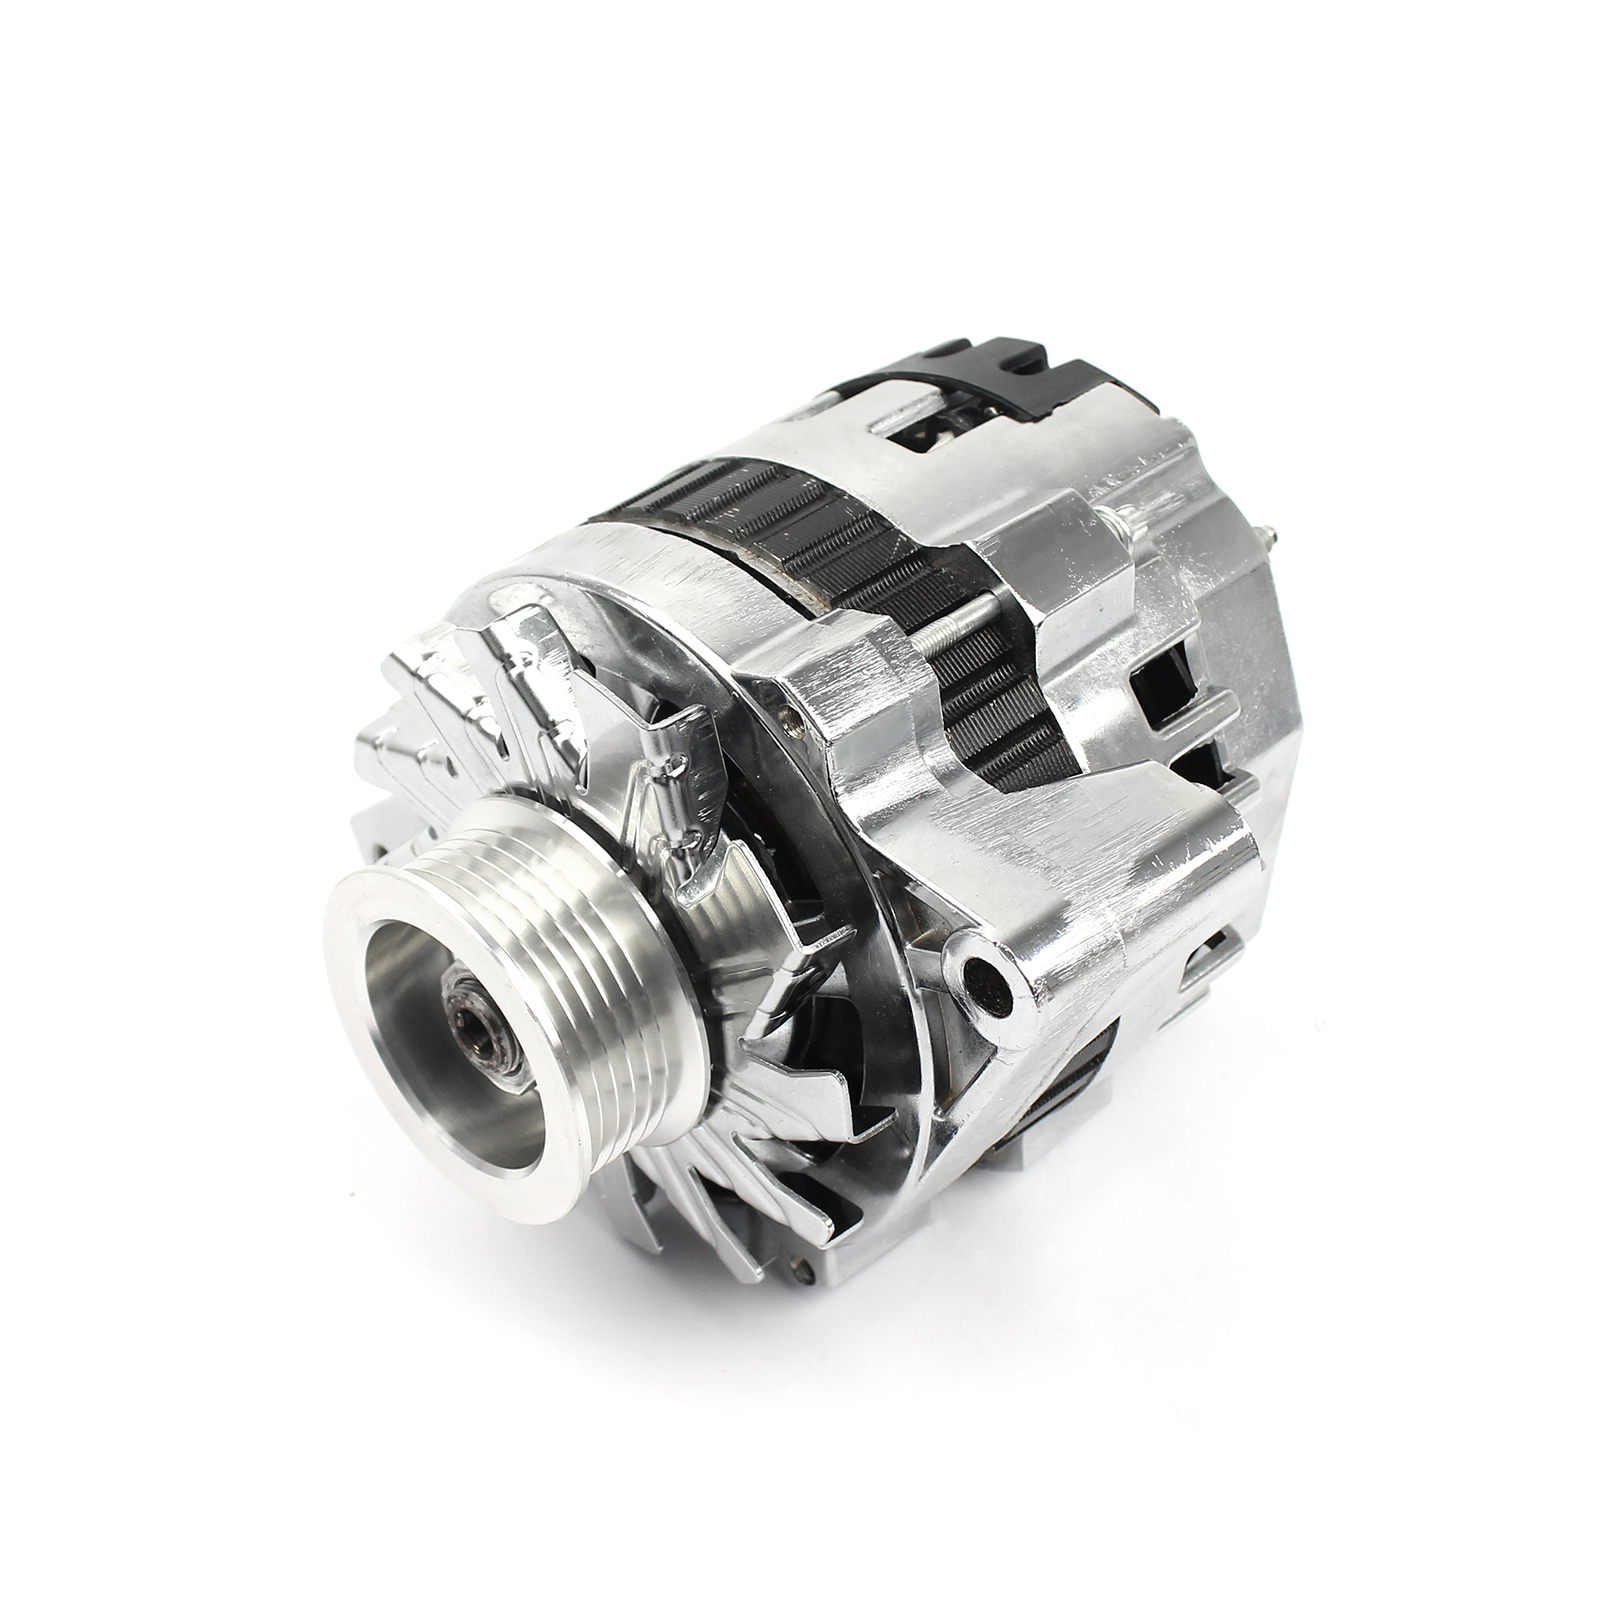 Universal Serpentine 130 Amp High Output Chrome Alternator